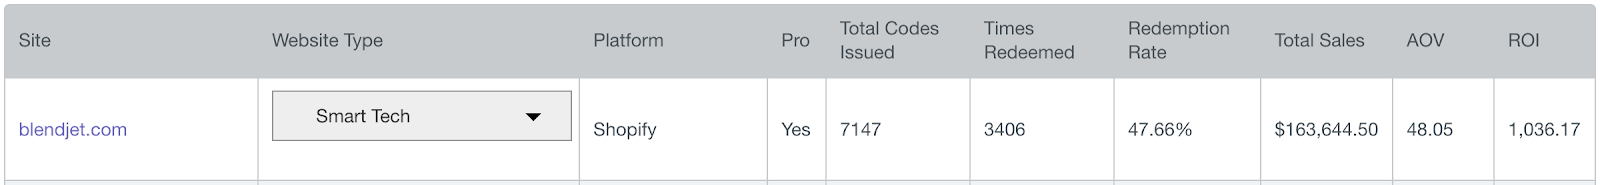 Screenshot showing discount code stats for blendjet.com